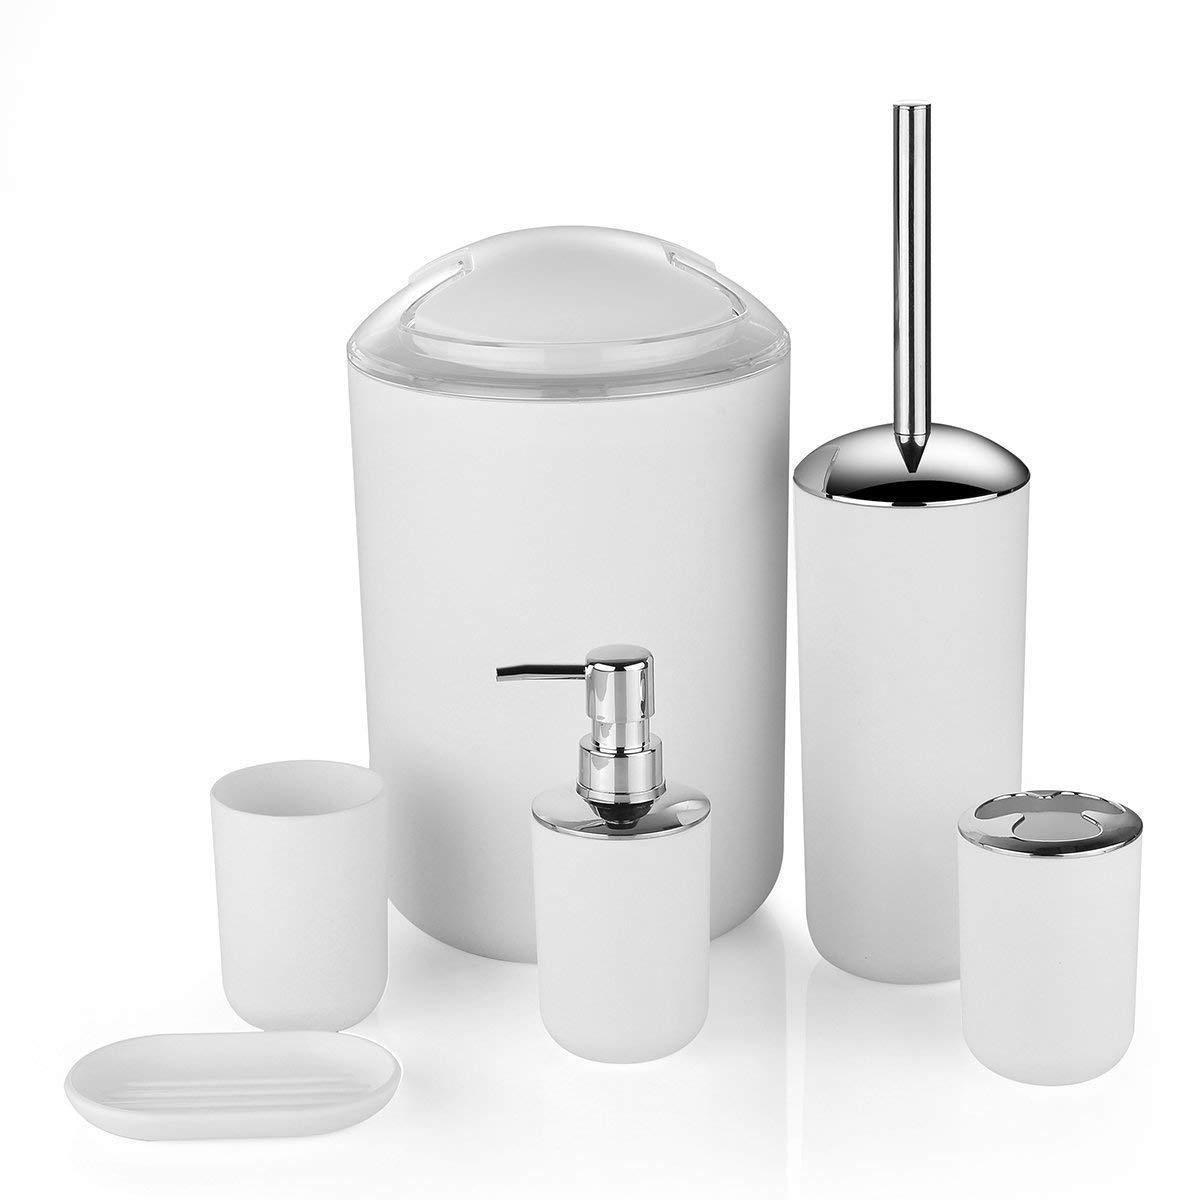 St@llion White 6 Piece Bathroom Accessory Set Lotion Bottles, Toothbrush Holder, Tooth Mug, Soap Dish, Toilet Brush, Trash Can, Rubbish Bin